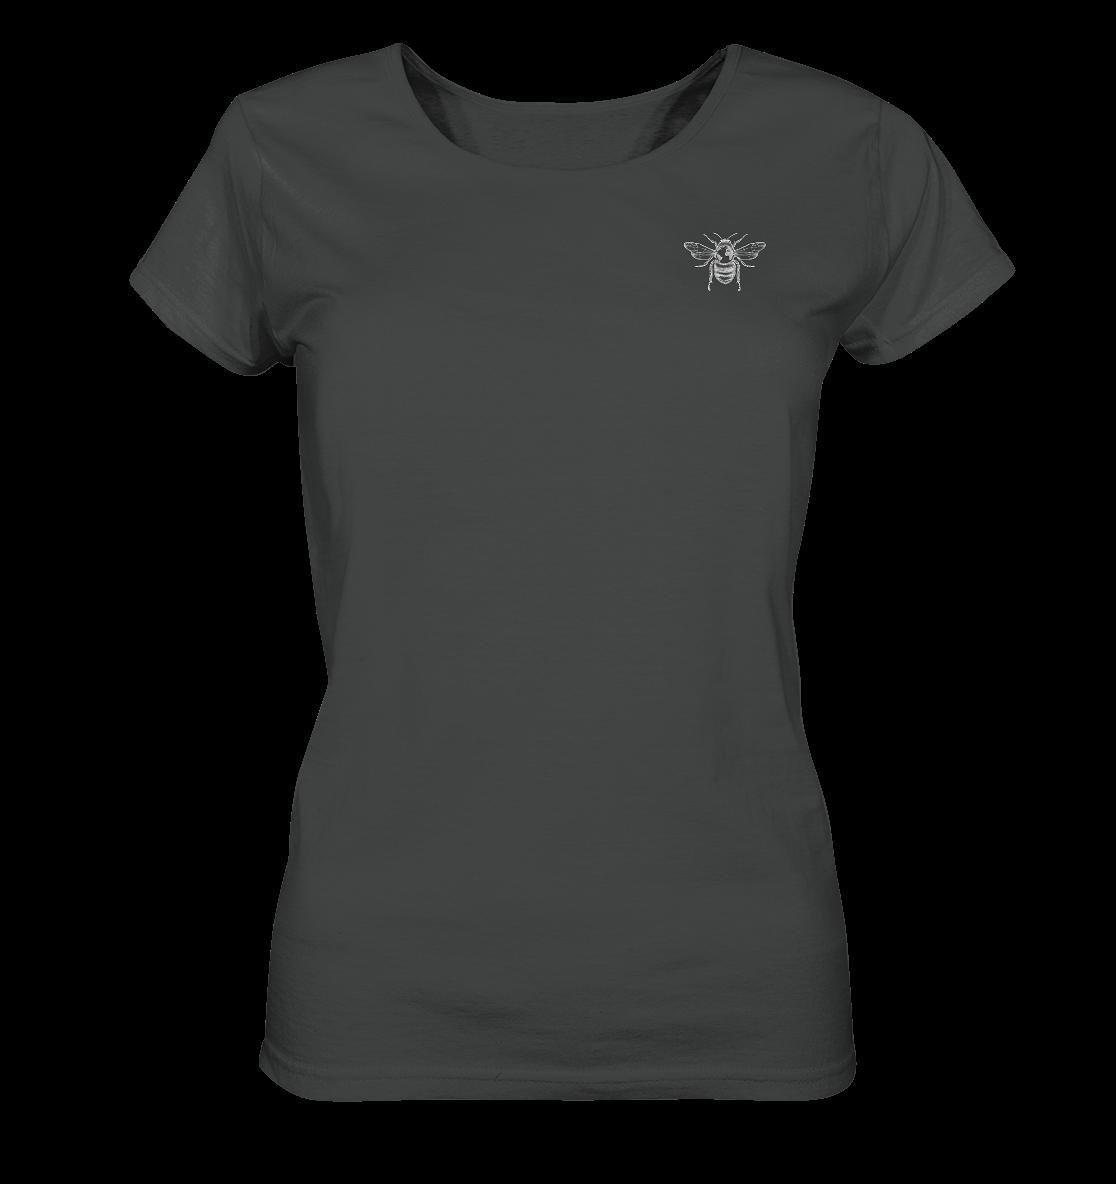 front-ladies-organic-shirt-444545-1116x.png